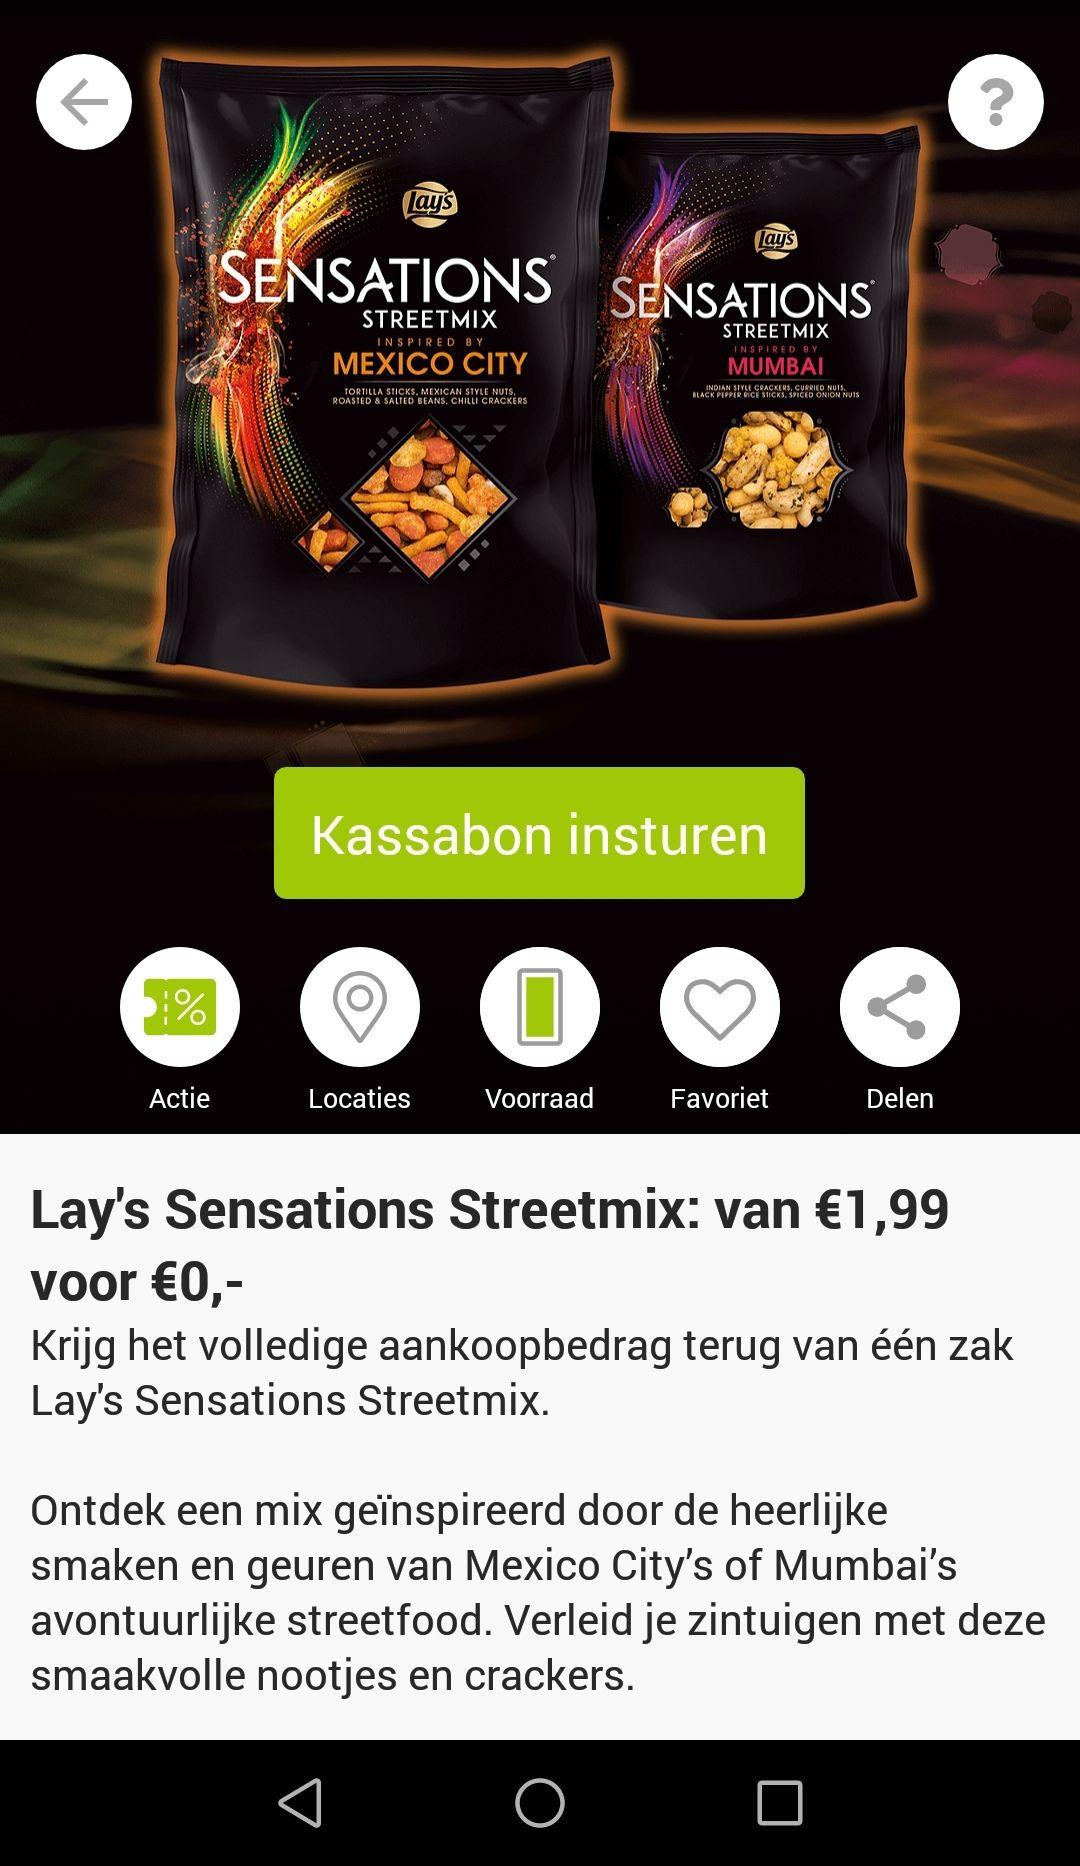 Sneak Preview scoupy met o.a. Gratis Lay's sensation streetmix